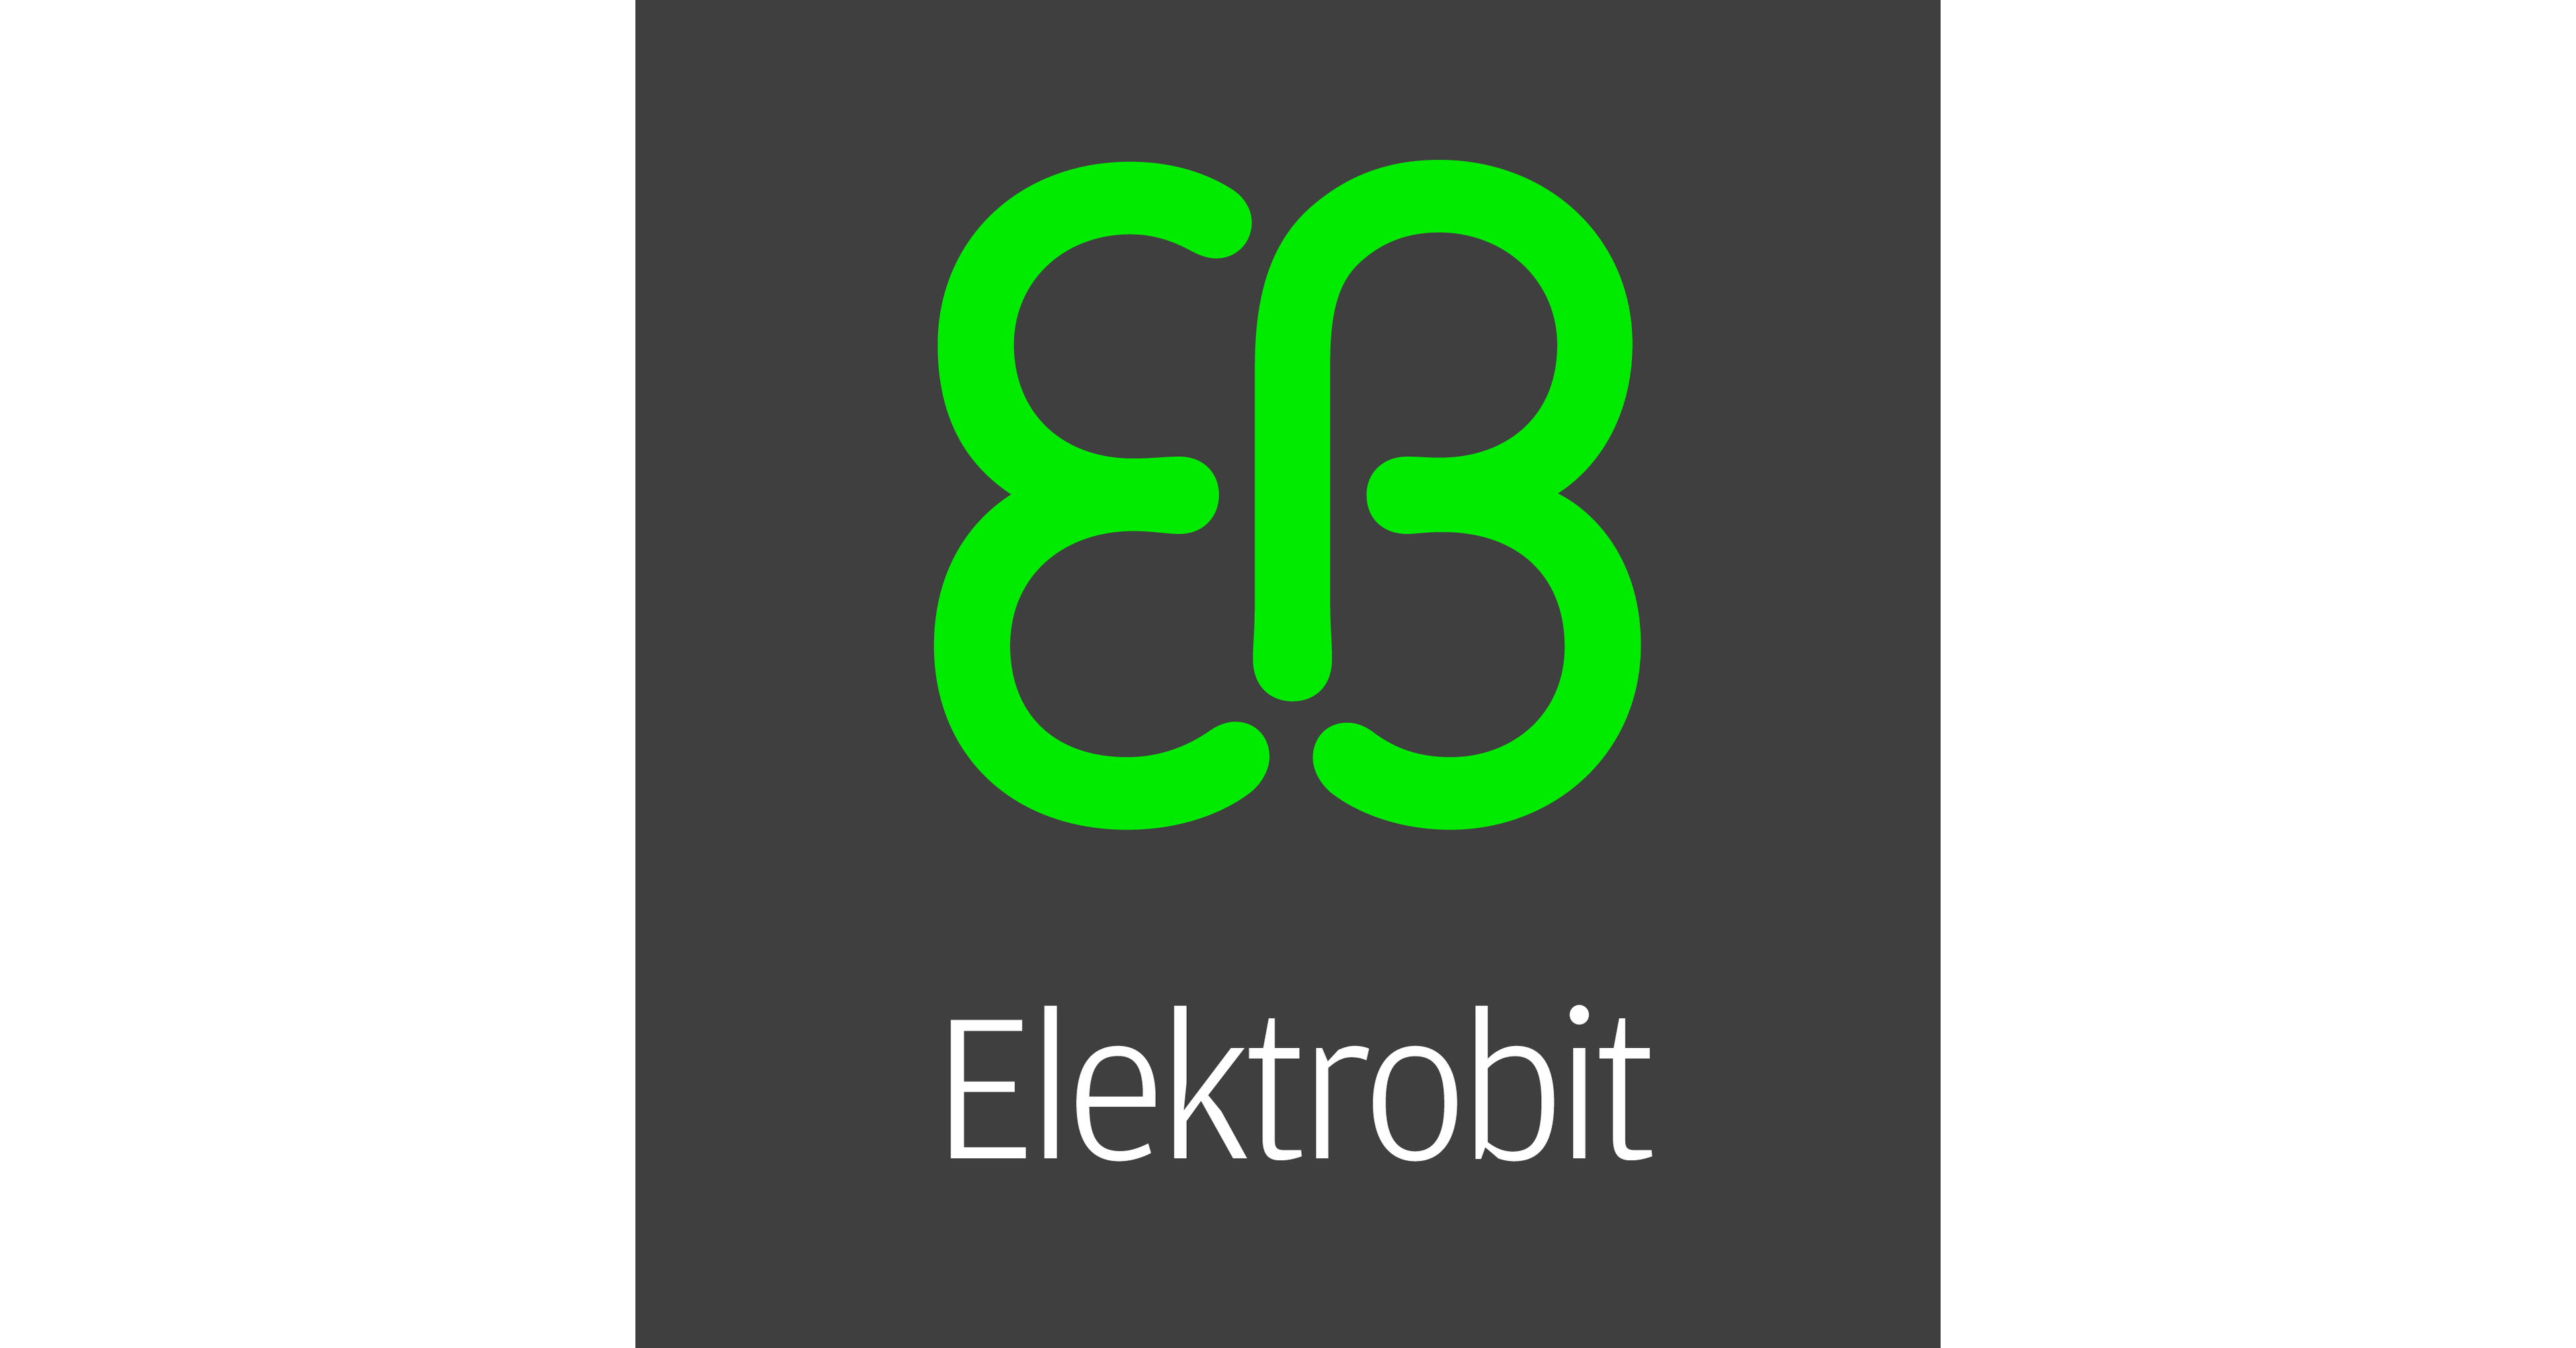 Elektrobit (EB) partners with Udacity to provide functional